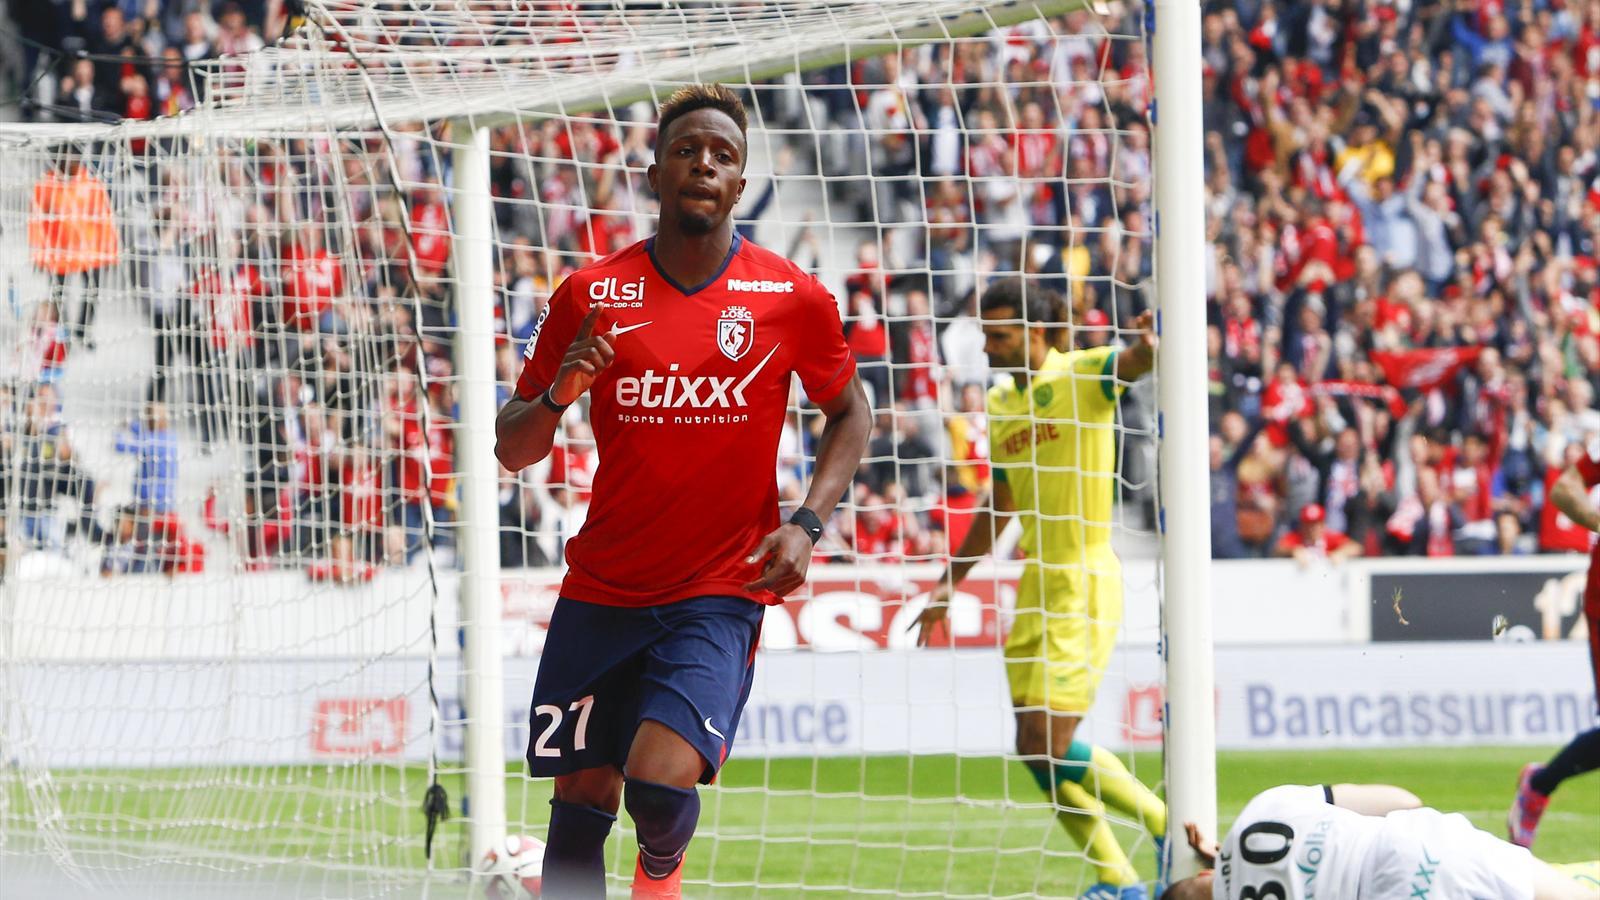 Match LOSC Lille vs Everton en direct live streaming